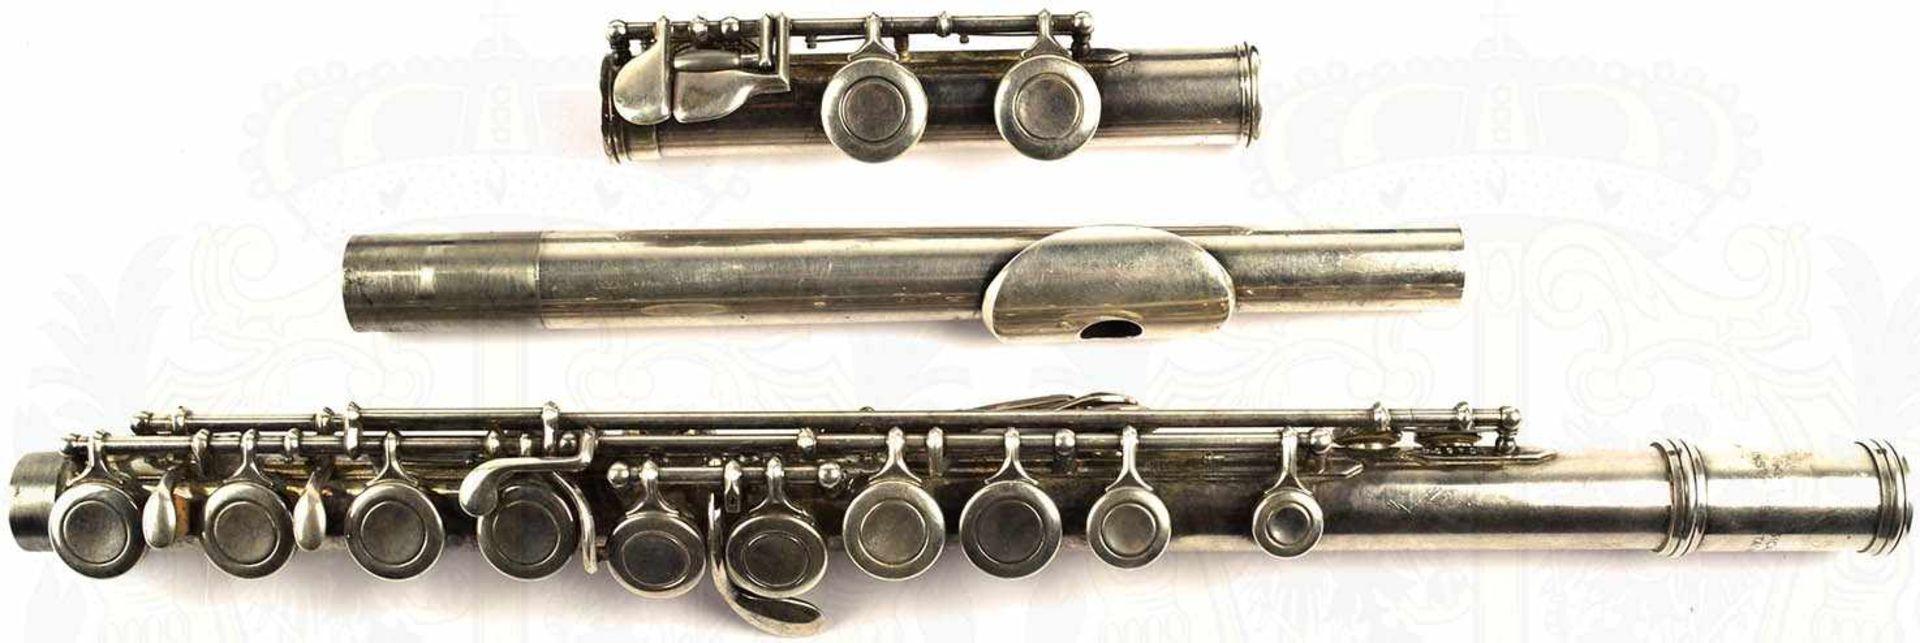 "QUERFLÖTE, Leichtmetall/vernickelt, m. Kopf-, Mittel u. Fußstück, Herst. ""Jupiter"", K.H.S. Musical - Bild 4 aus 4"